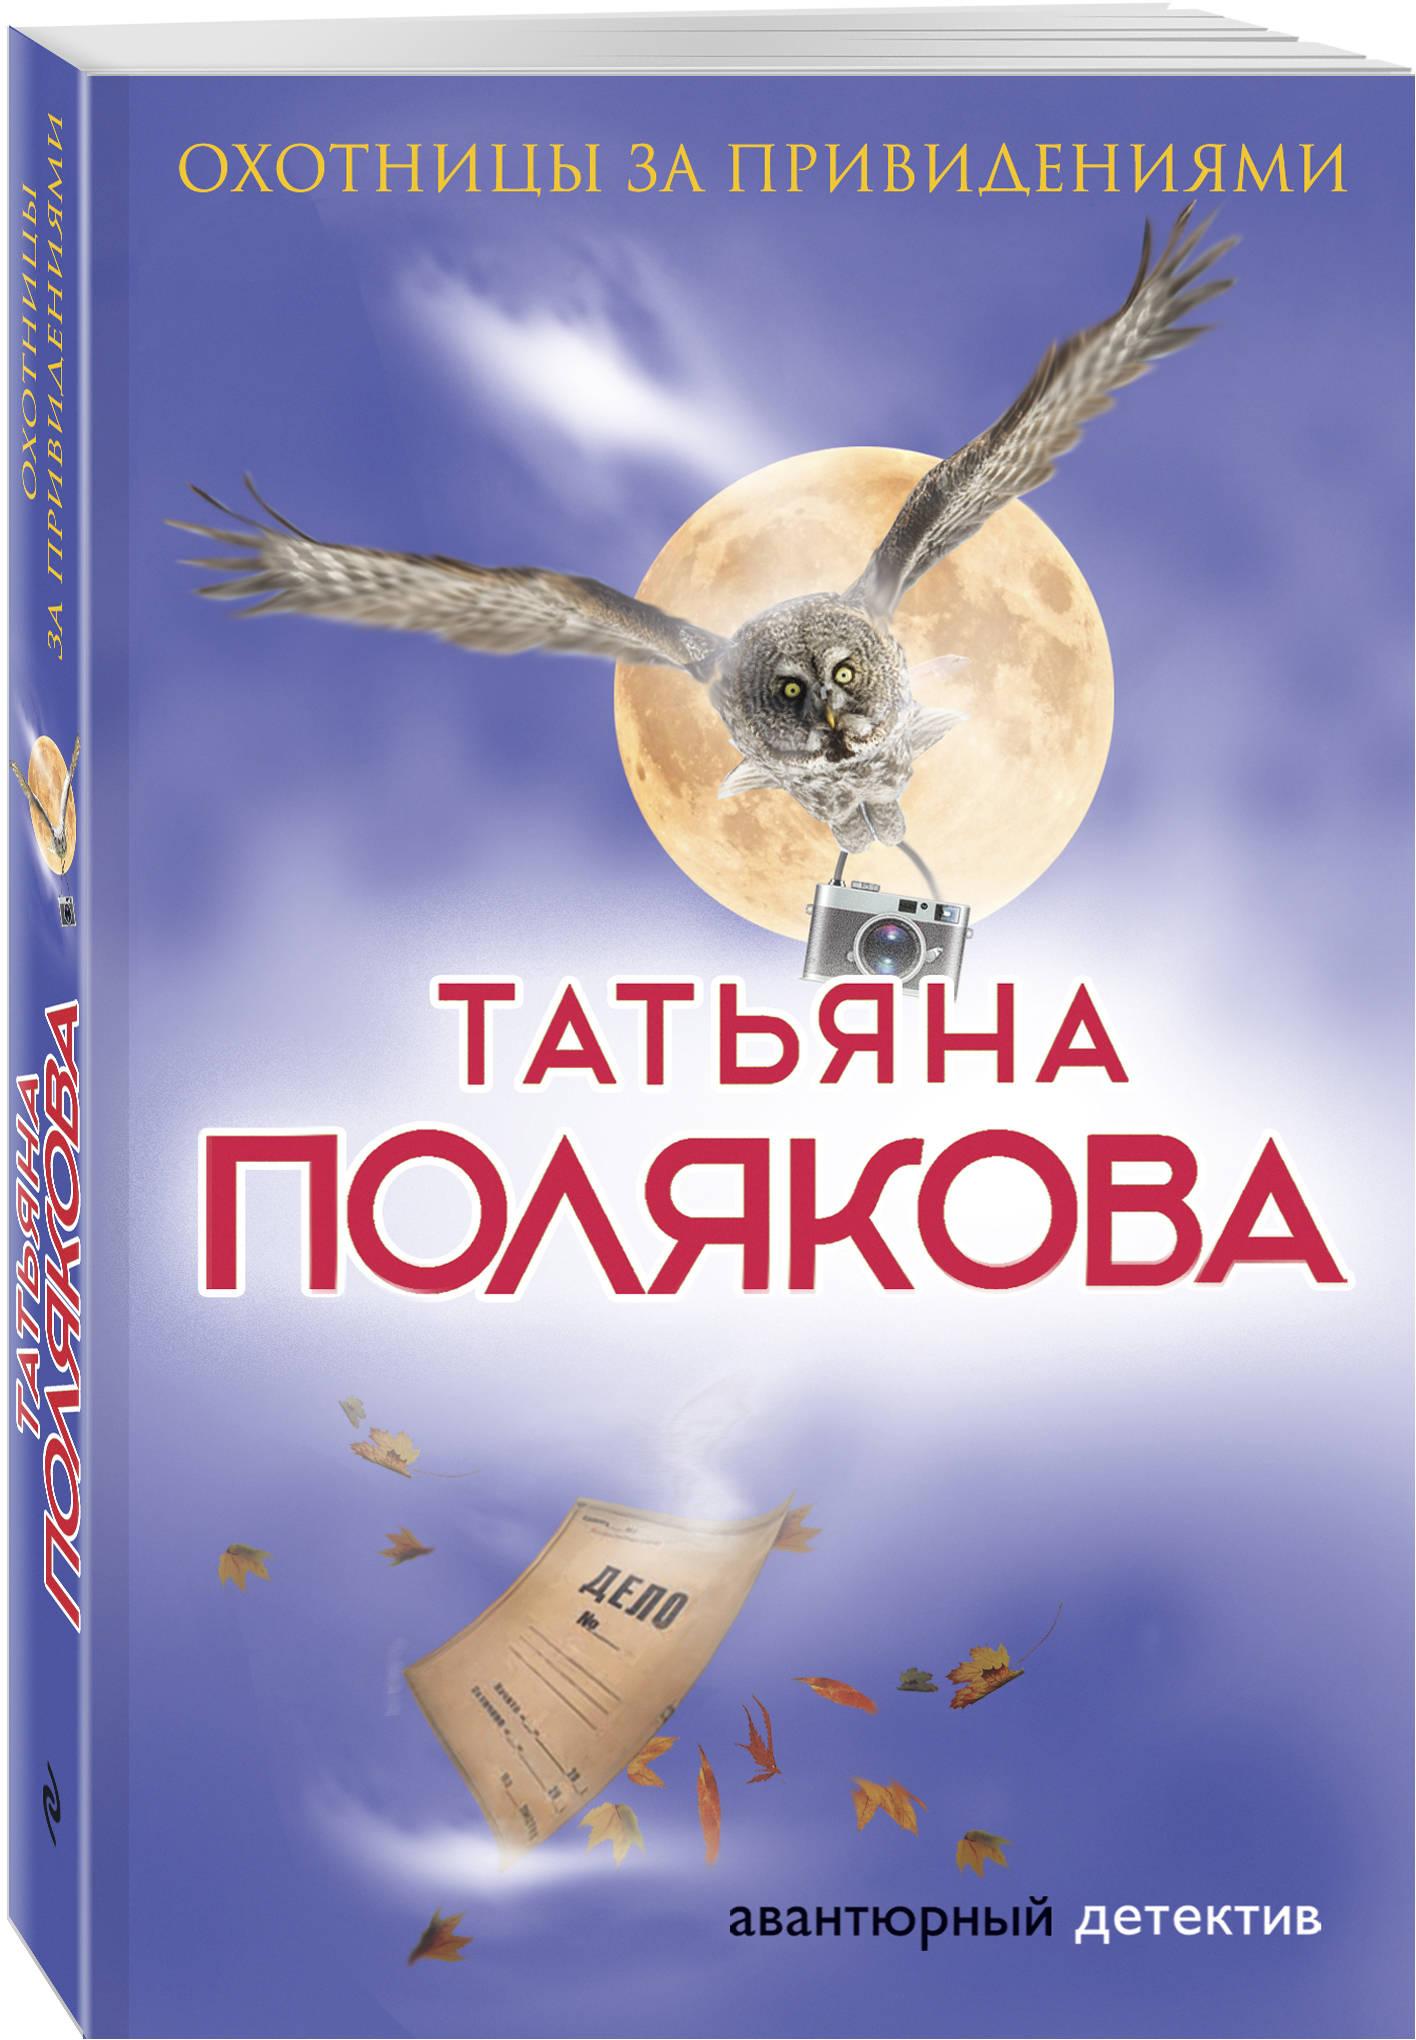 Полякова Т.В. Охотницы за привидениями мария жукова гладкова в гости по ночам…